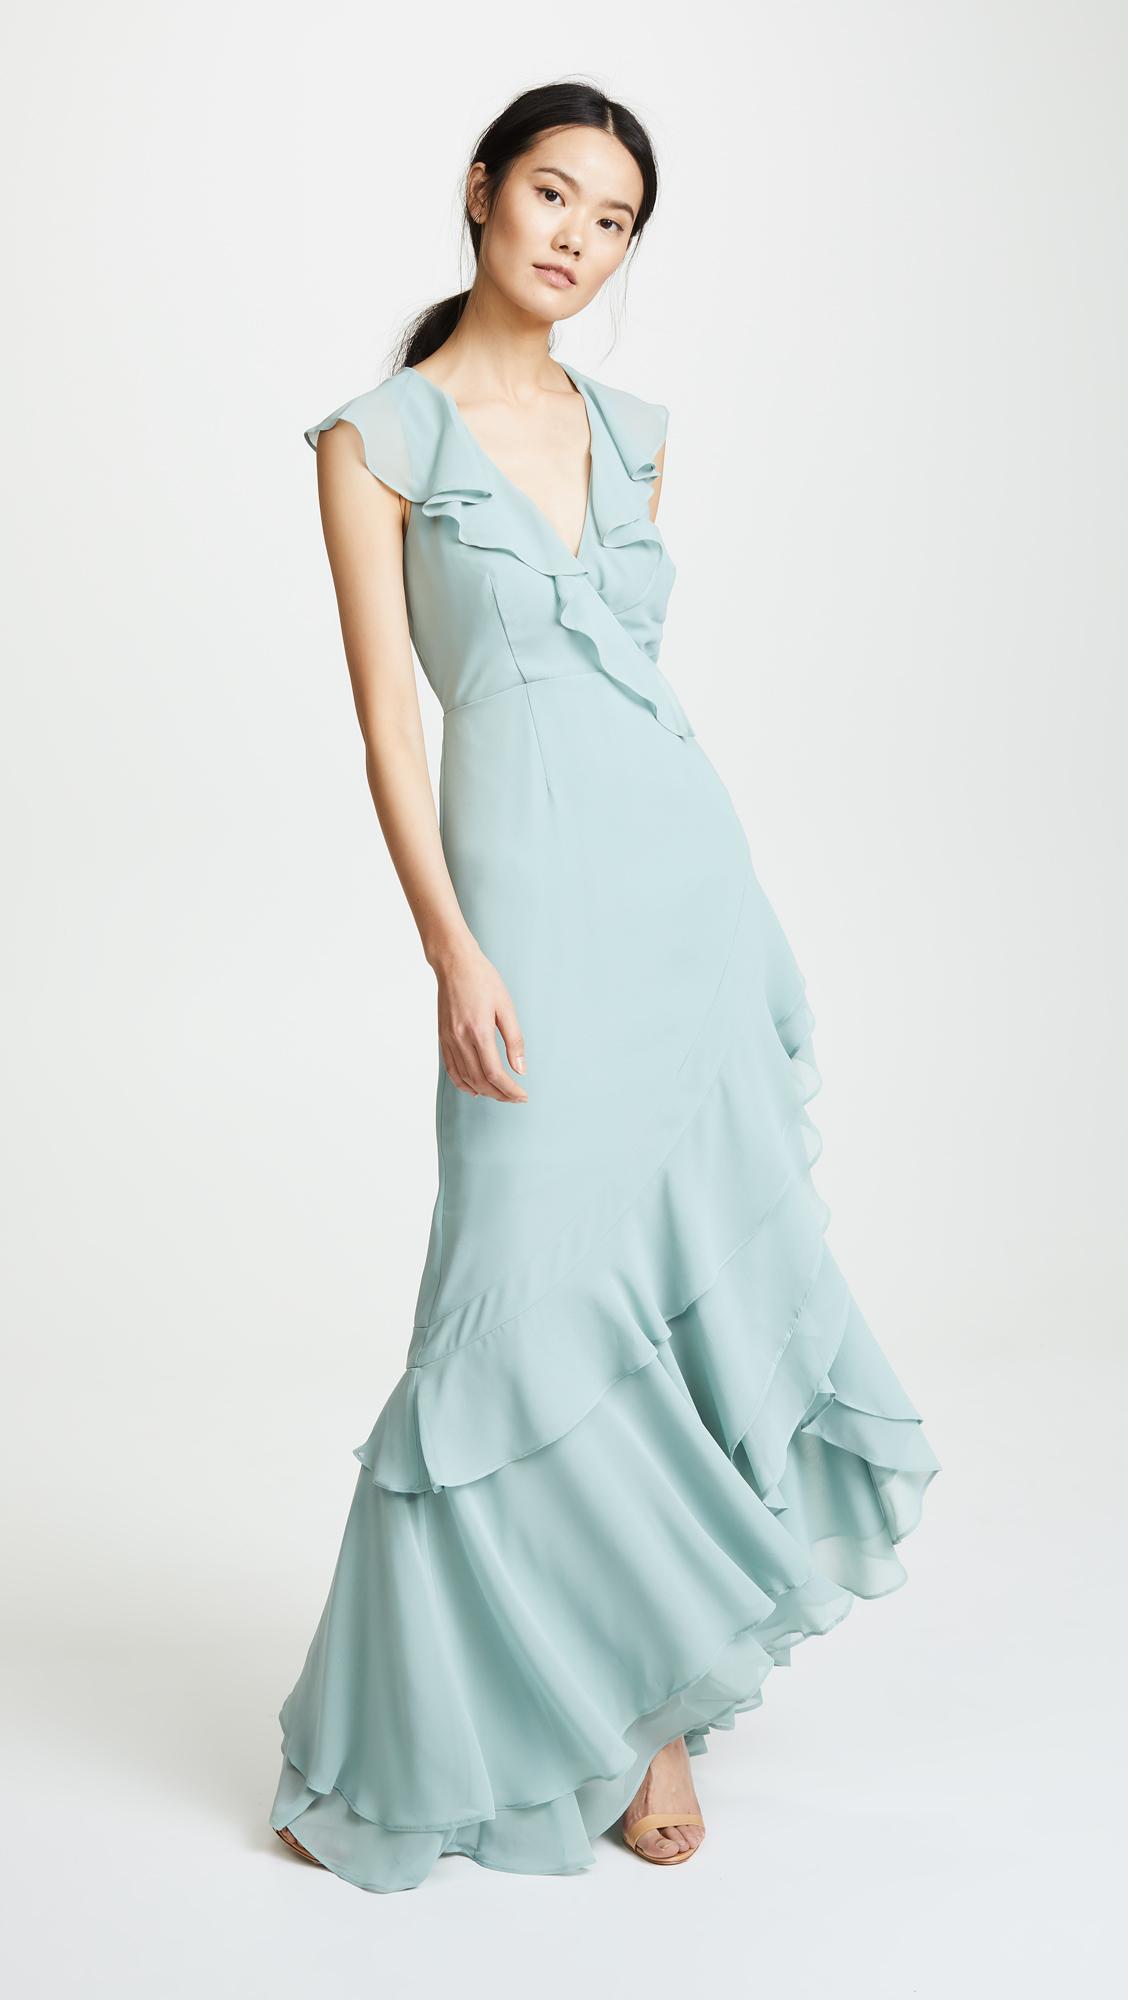 Colorful Genelia D Souza Wedding Gown Sketch - All Wedding Dresses ...